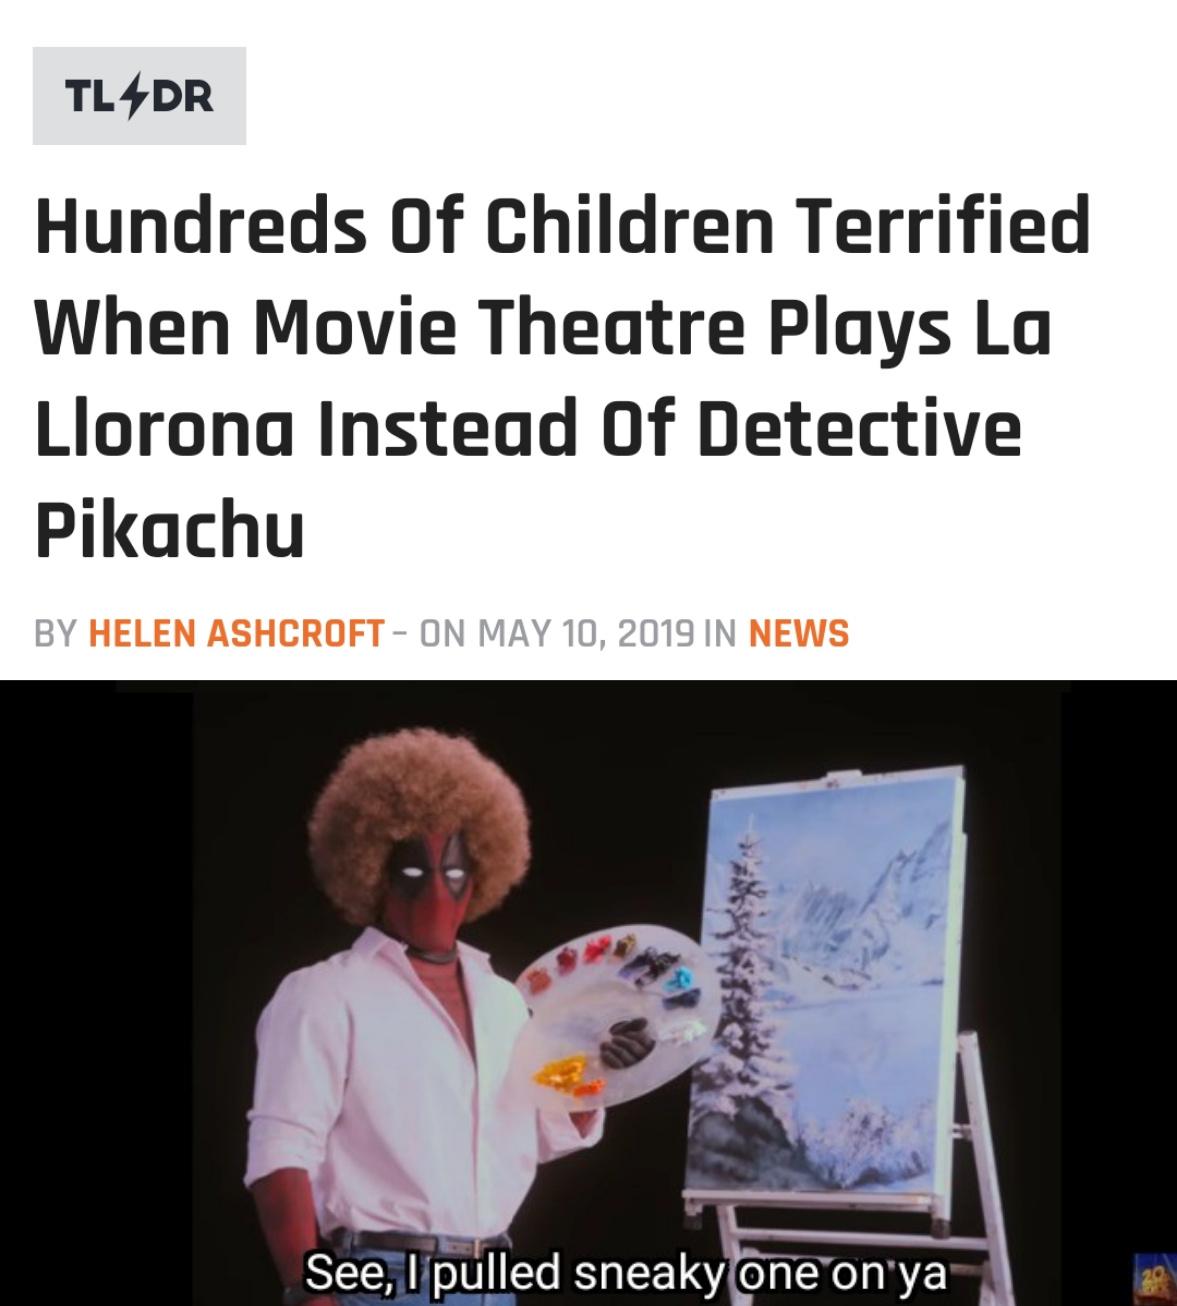 La Llorna=horror film - meme